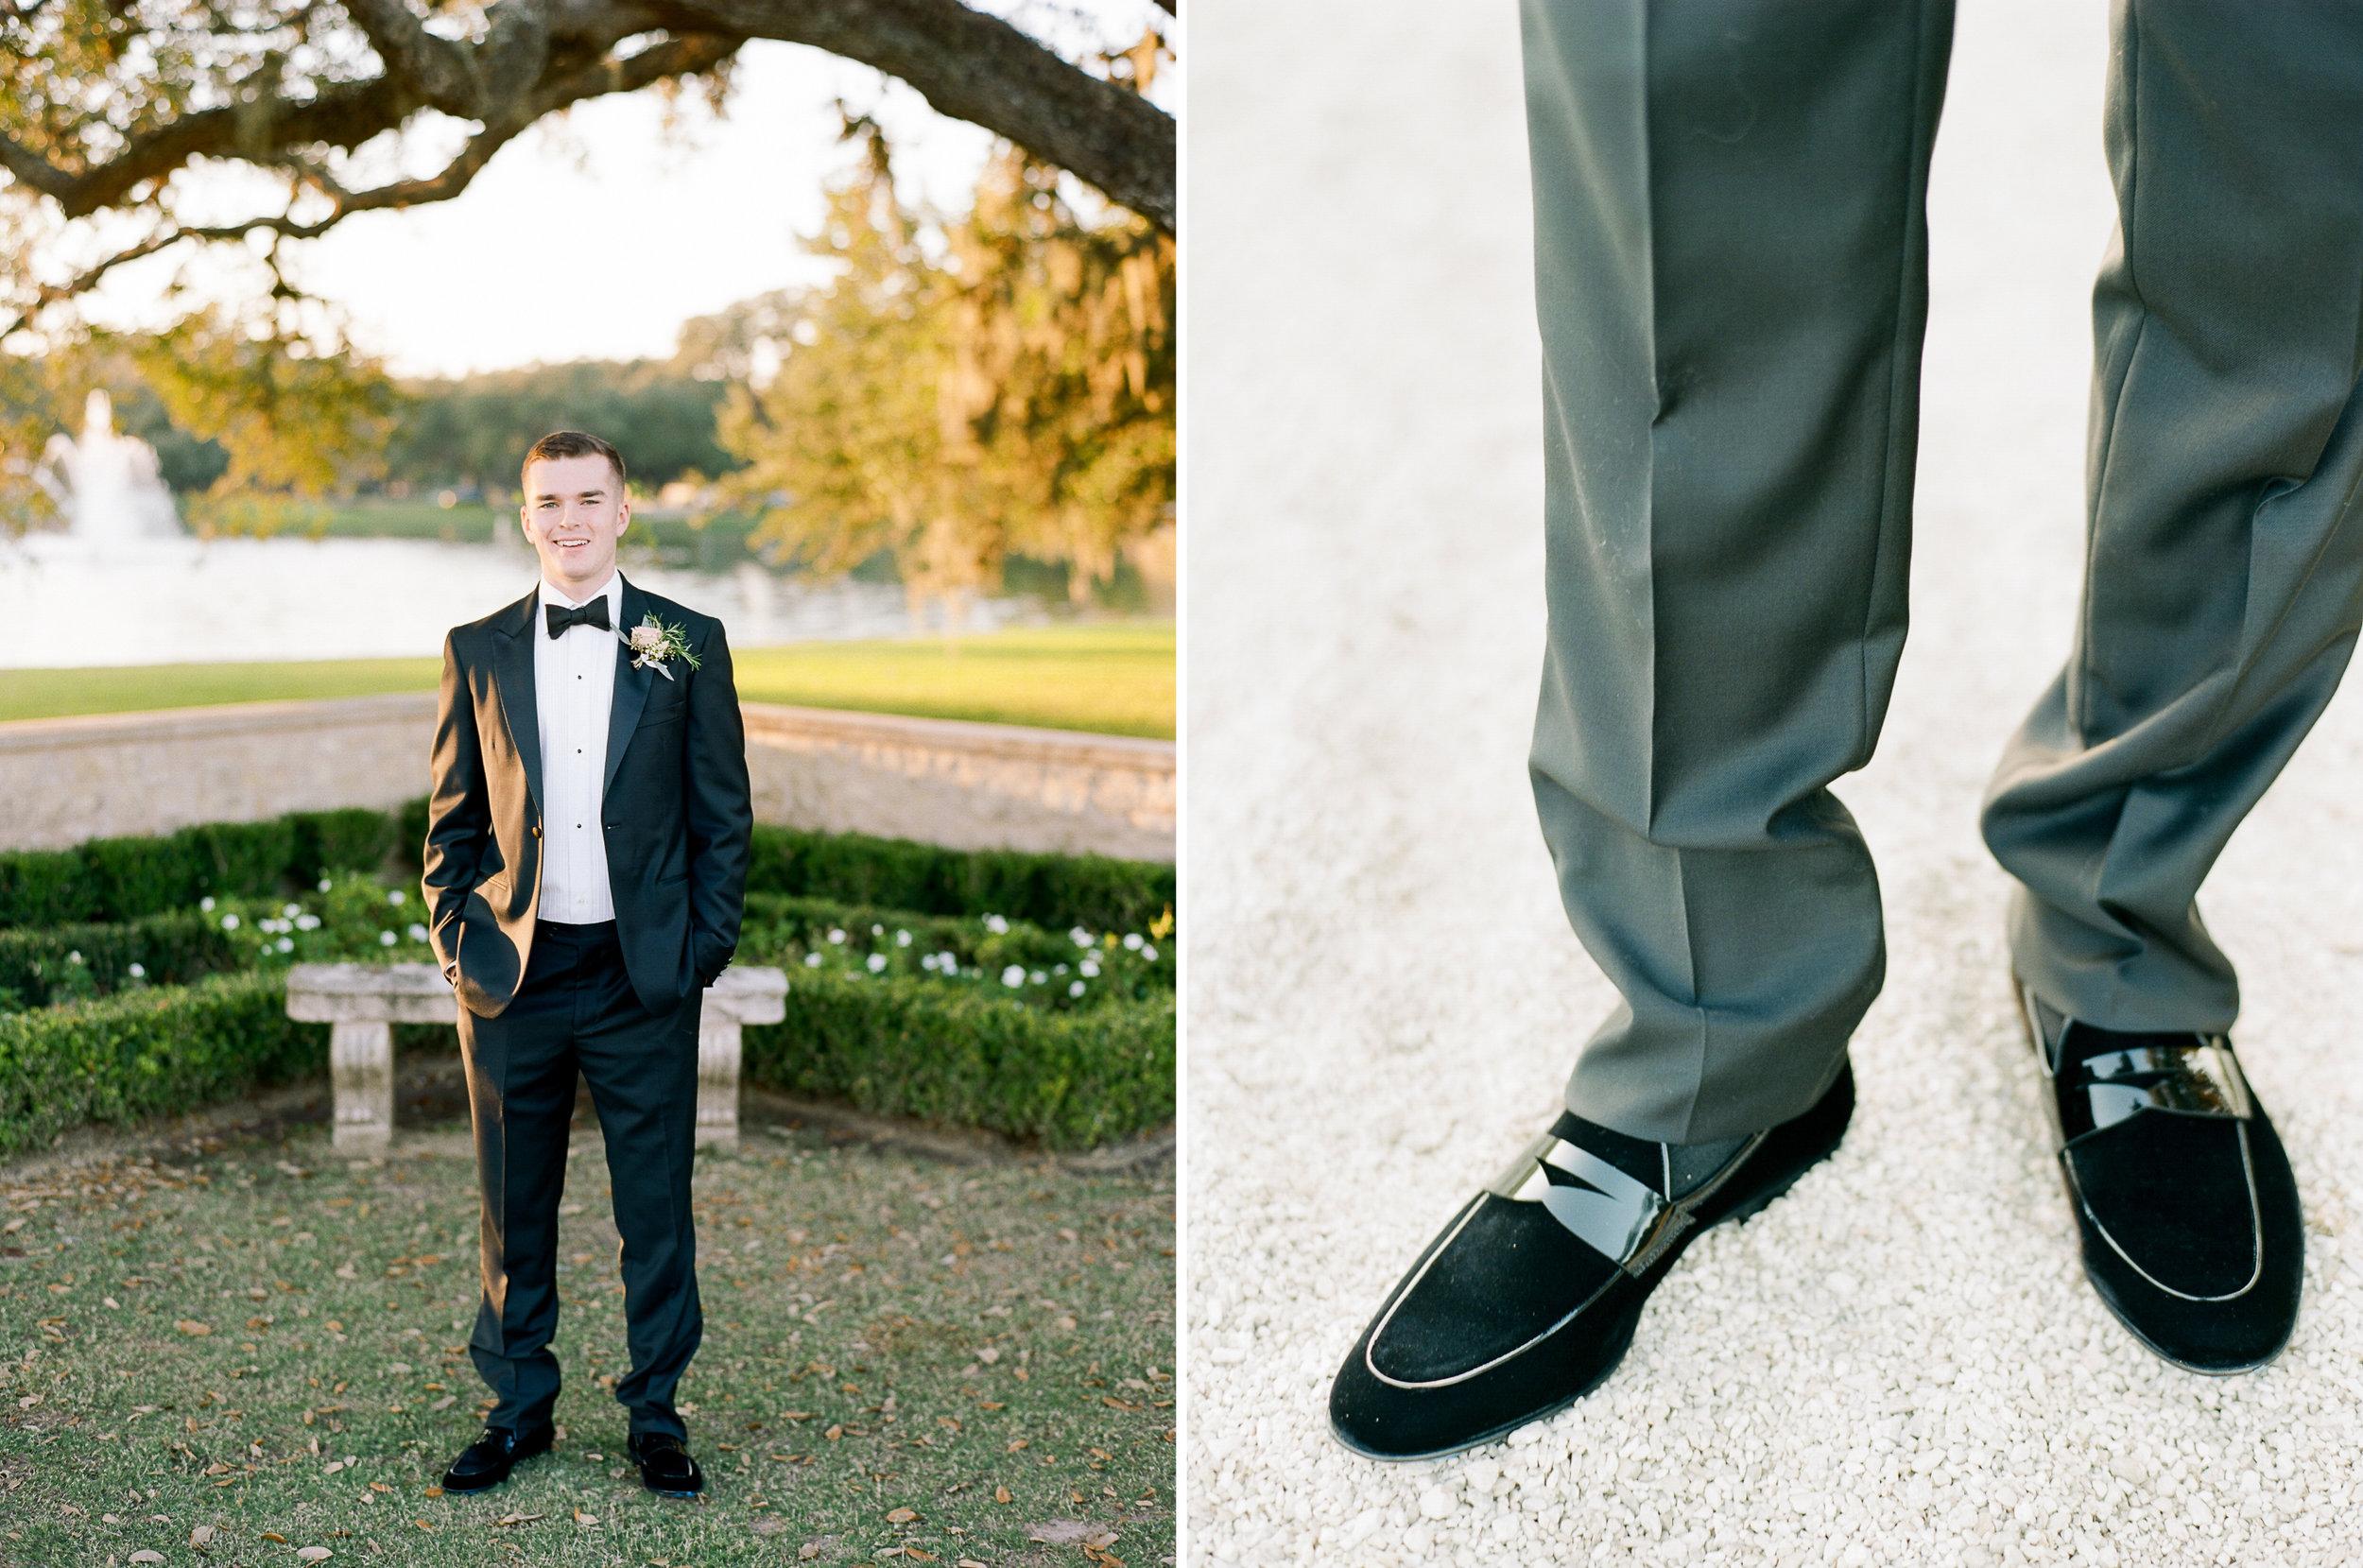 Top-Houston-Wedding-Photographer-Dana-Fernandez-Photography-The-Clubs-At-Houston-Oaks-Country-Club-Belle-Events-Film-Fine-Art-Destination-101.jpg